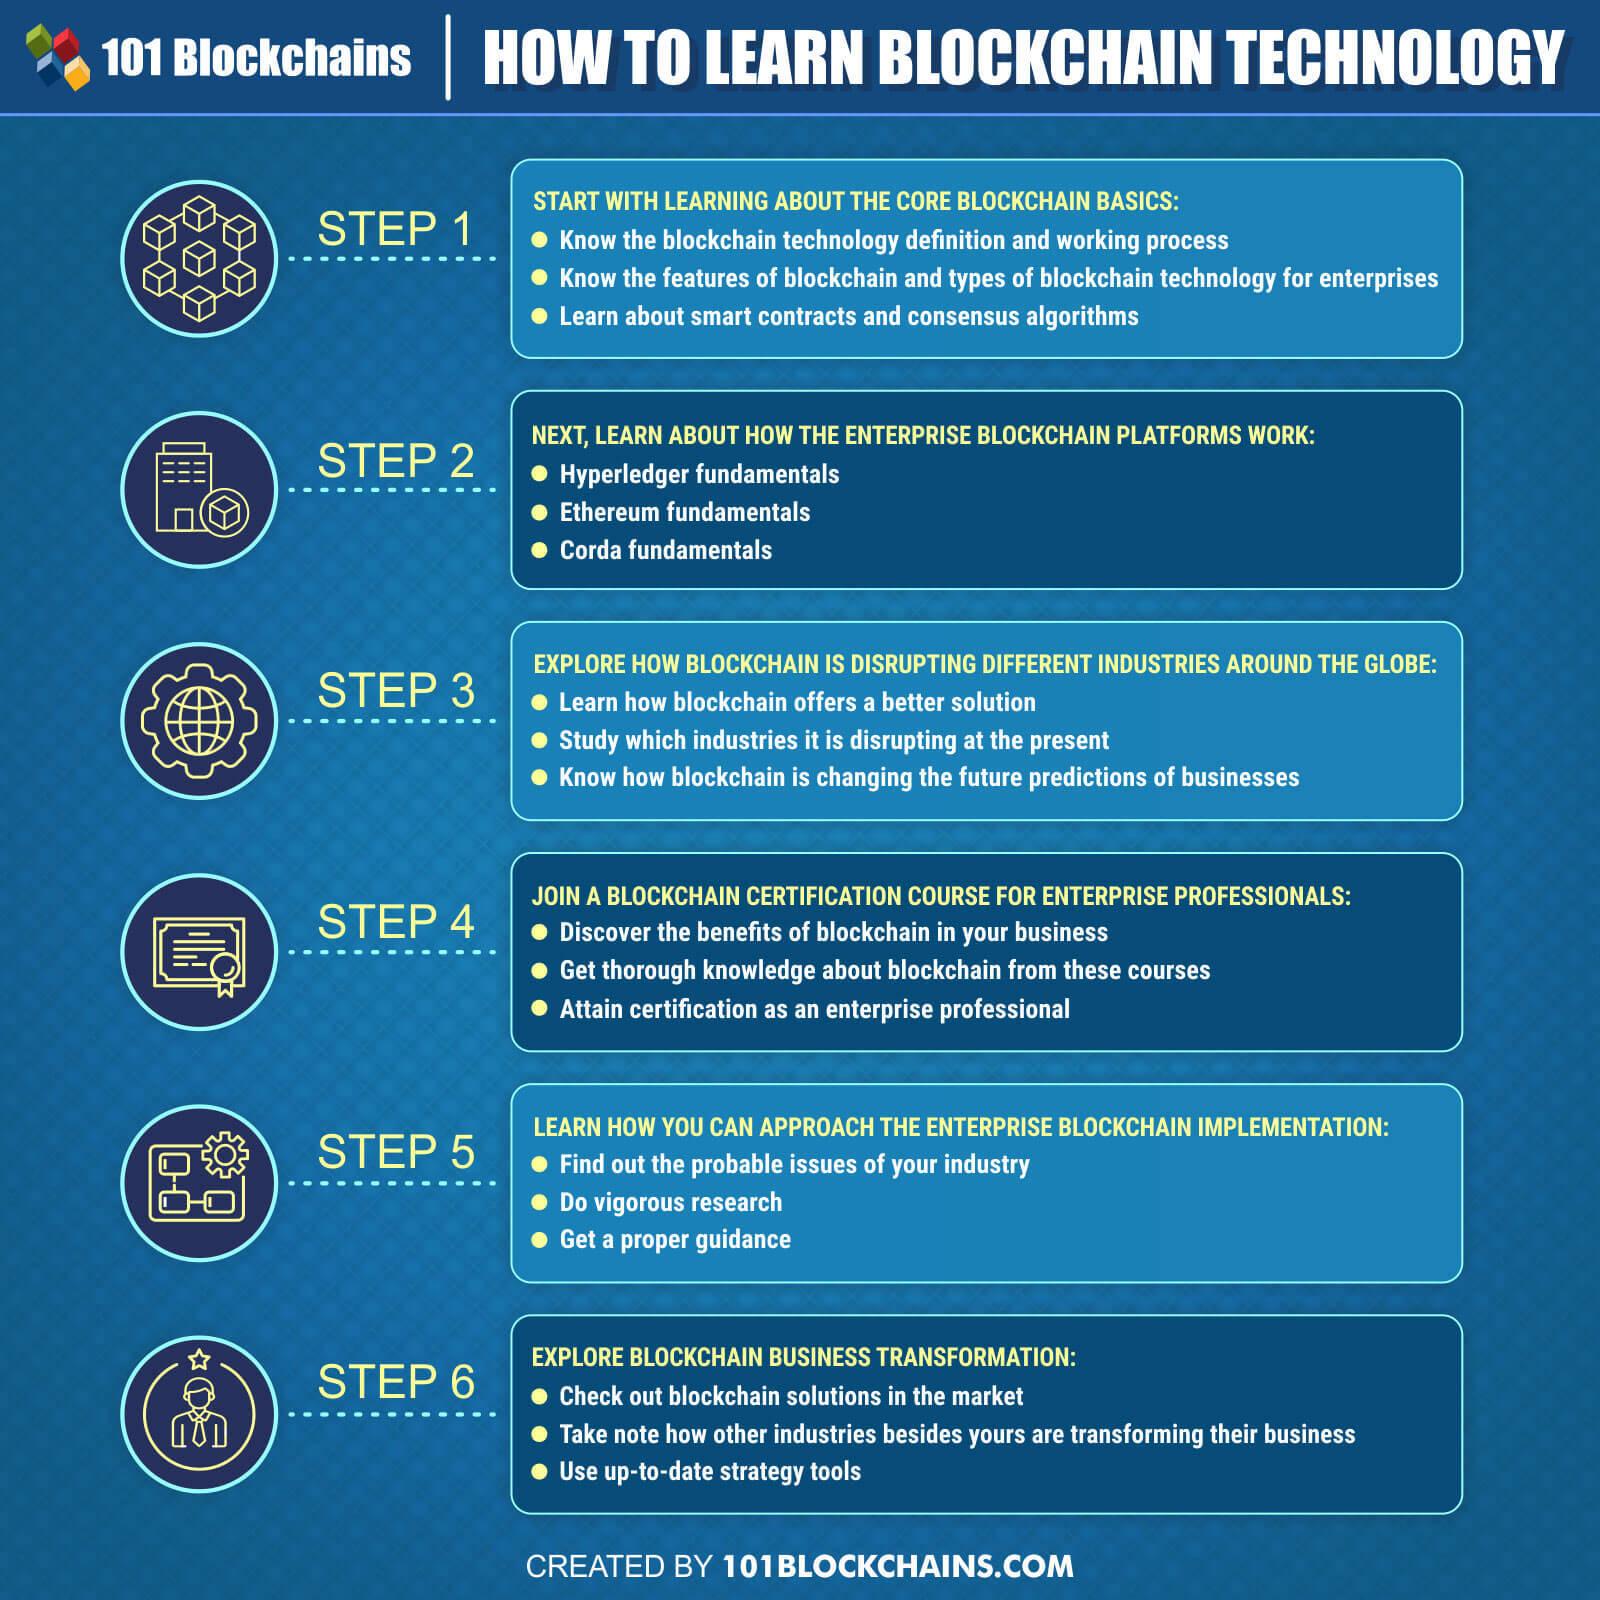 learn blockchain technology